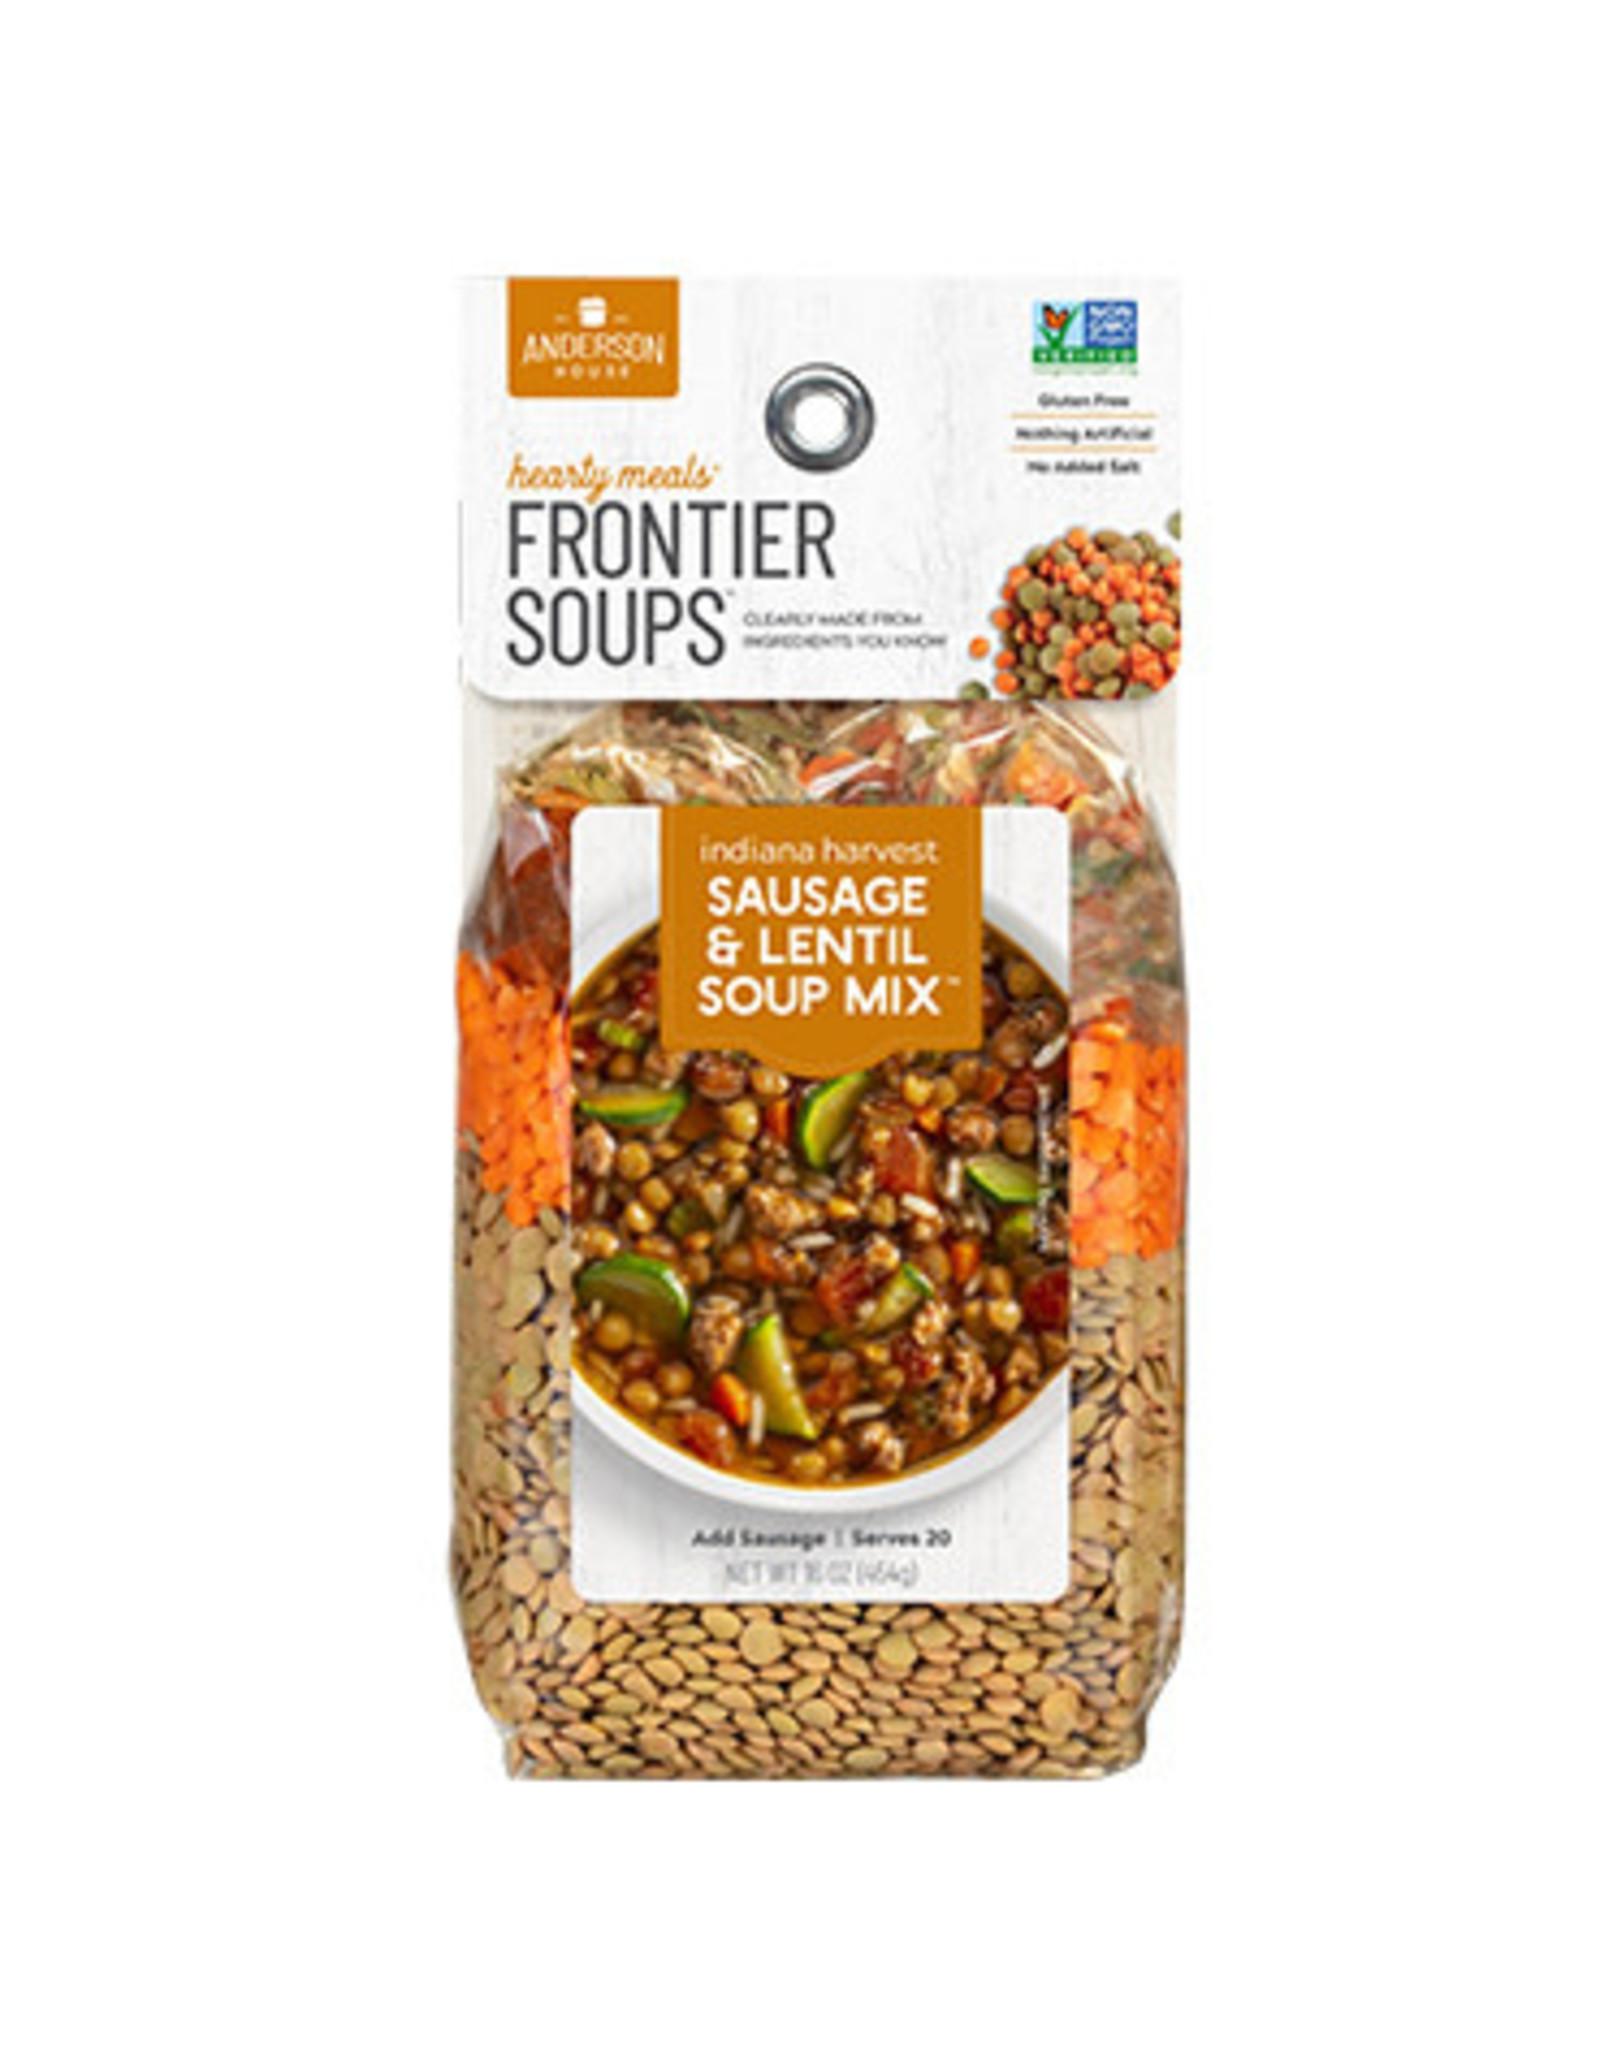 Frontier Soups INDIANA HARVEST SAUSAGE AND LENTIL SOUP